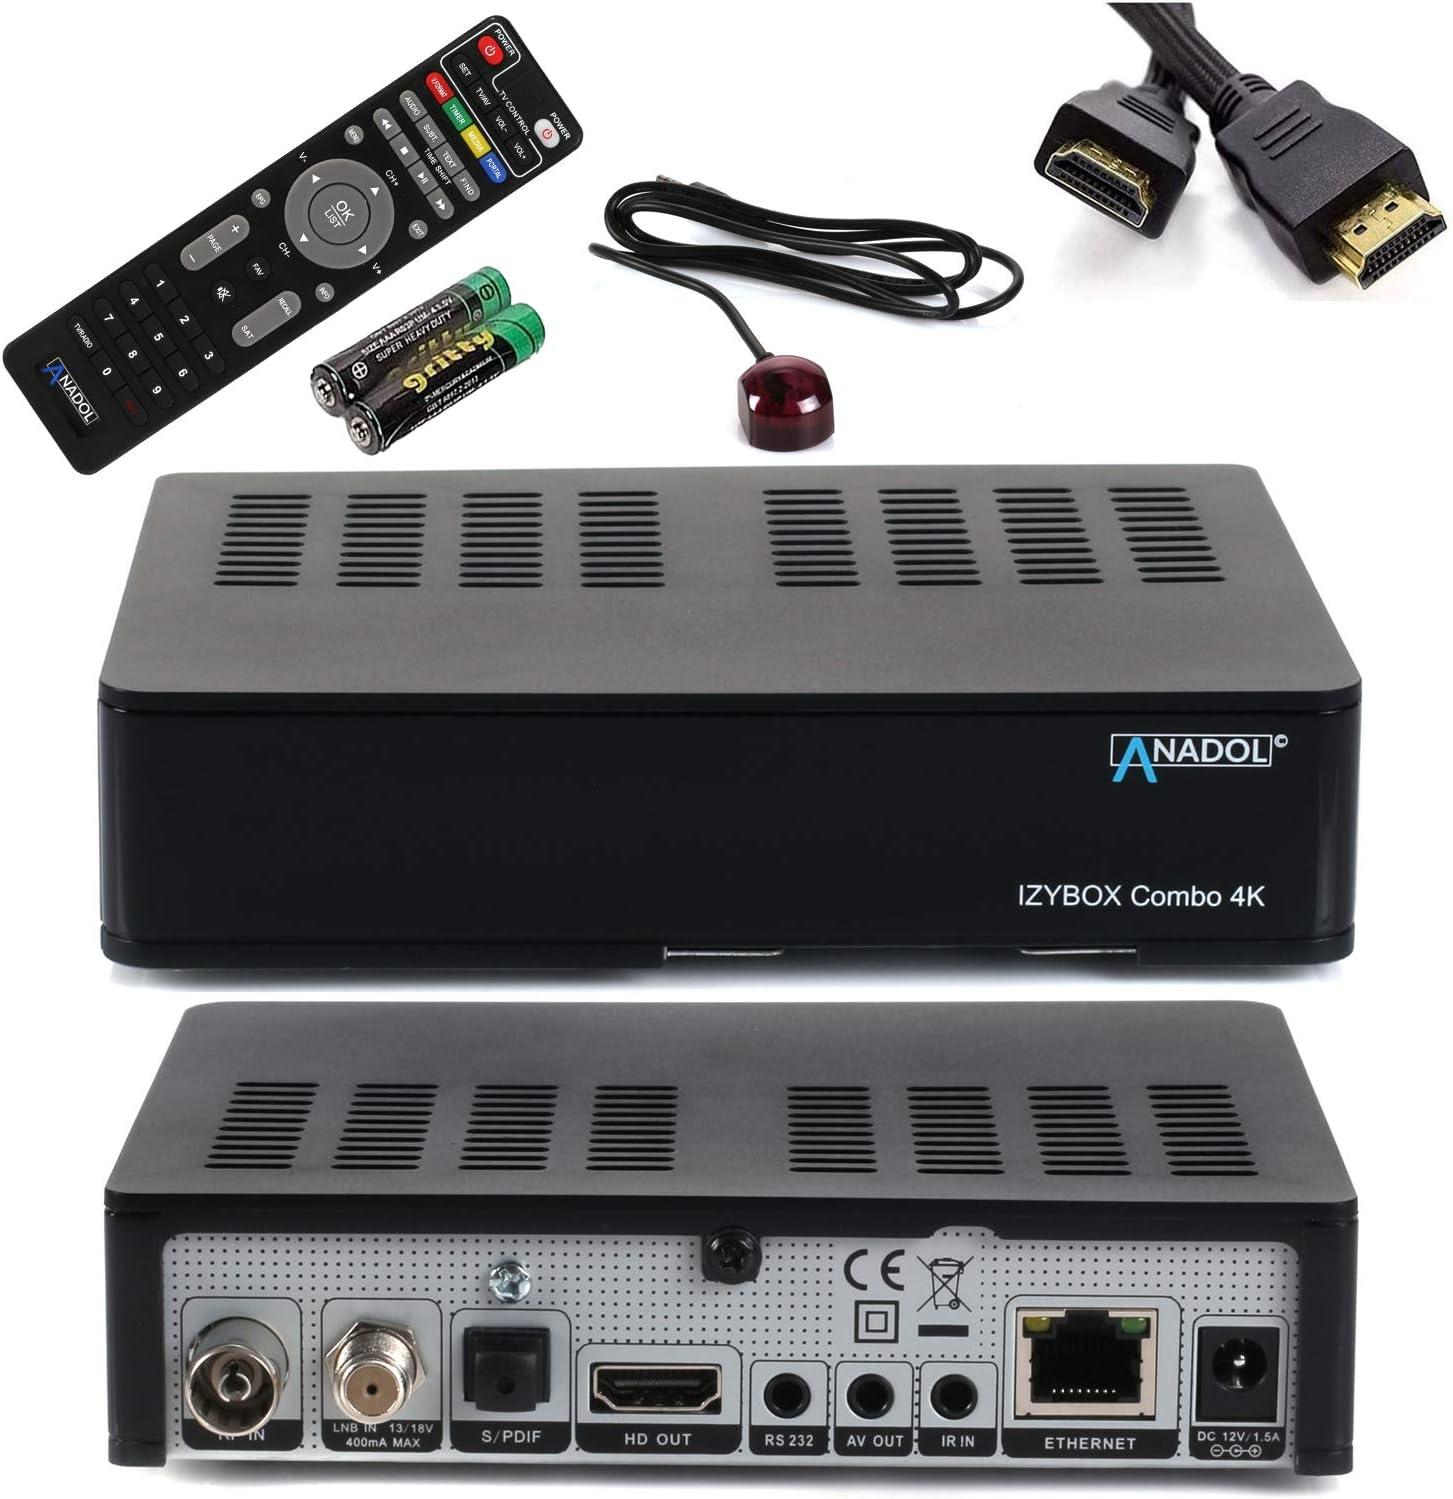 ANADOL IZYBOX Combo 4K Receptor de satélite, receptor de cable o receptor DVB-T2, sintonizador DVB-S2X, Multistream, 2X USB, lector de tarjetas, Astra ...